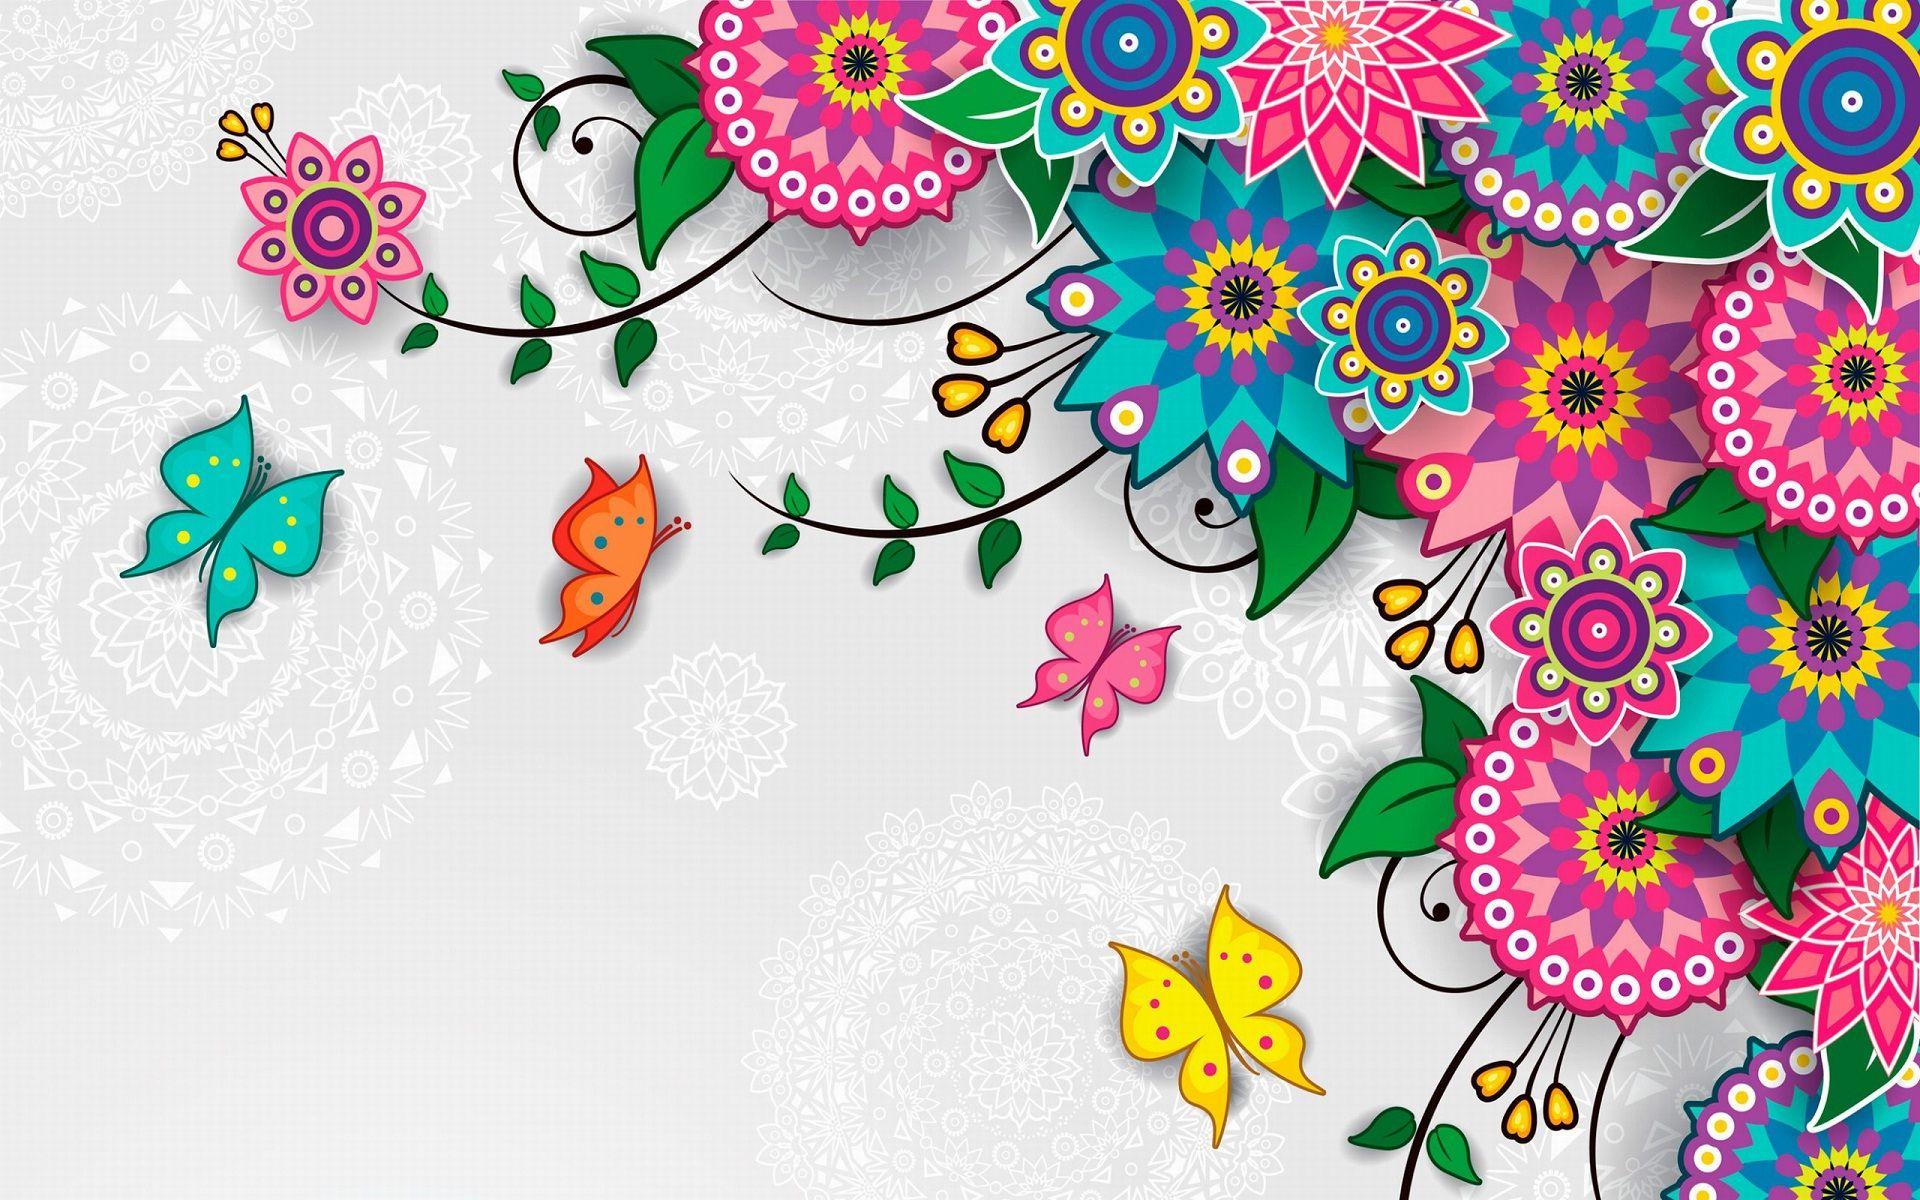 Creative Wallpaper Design 1919x1199 32 Wallpapers